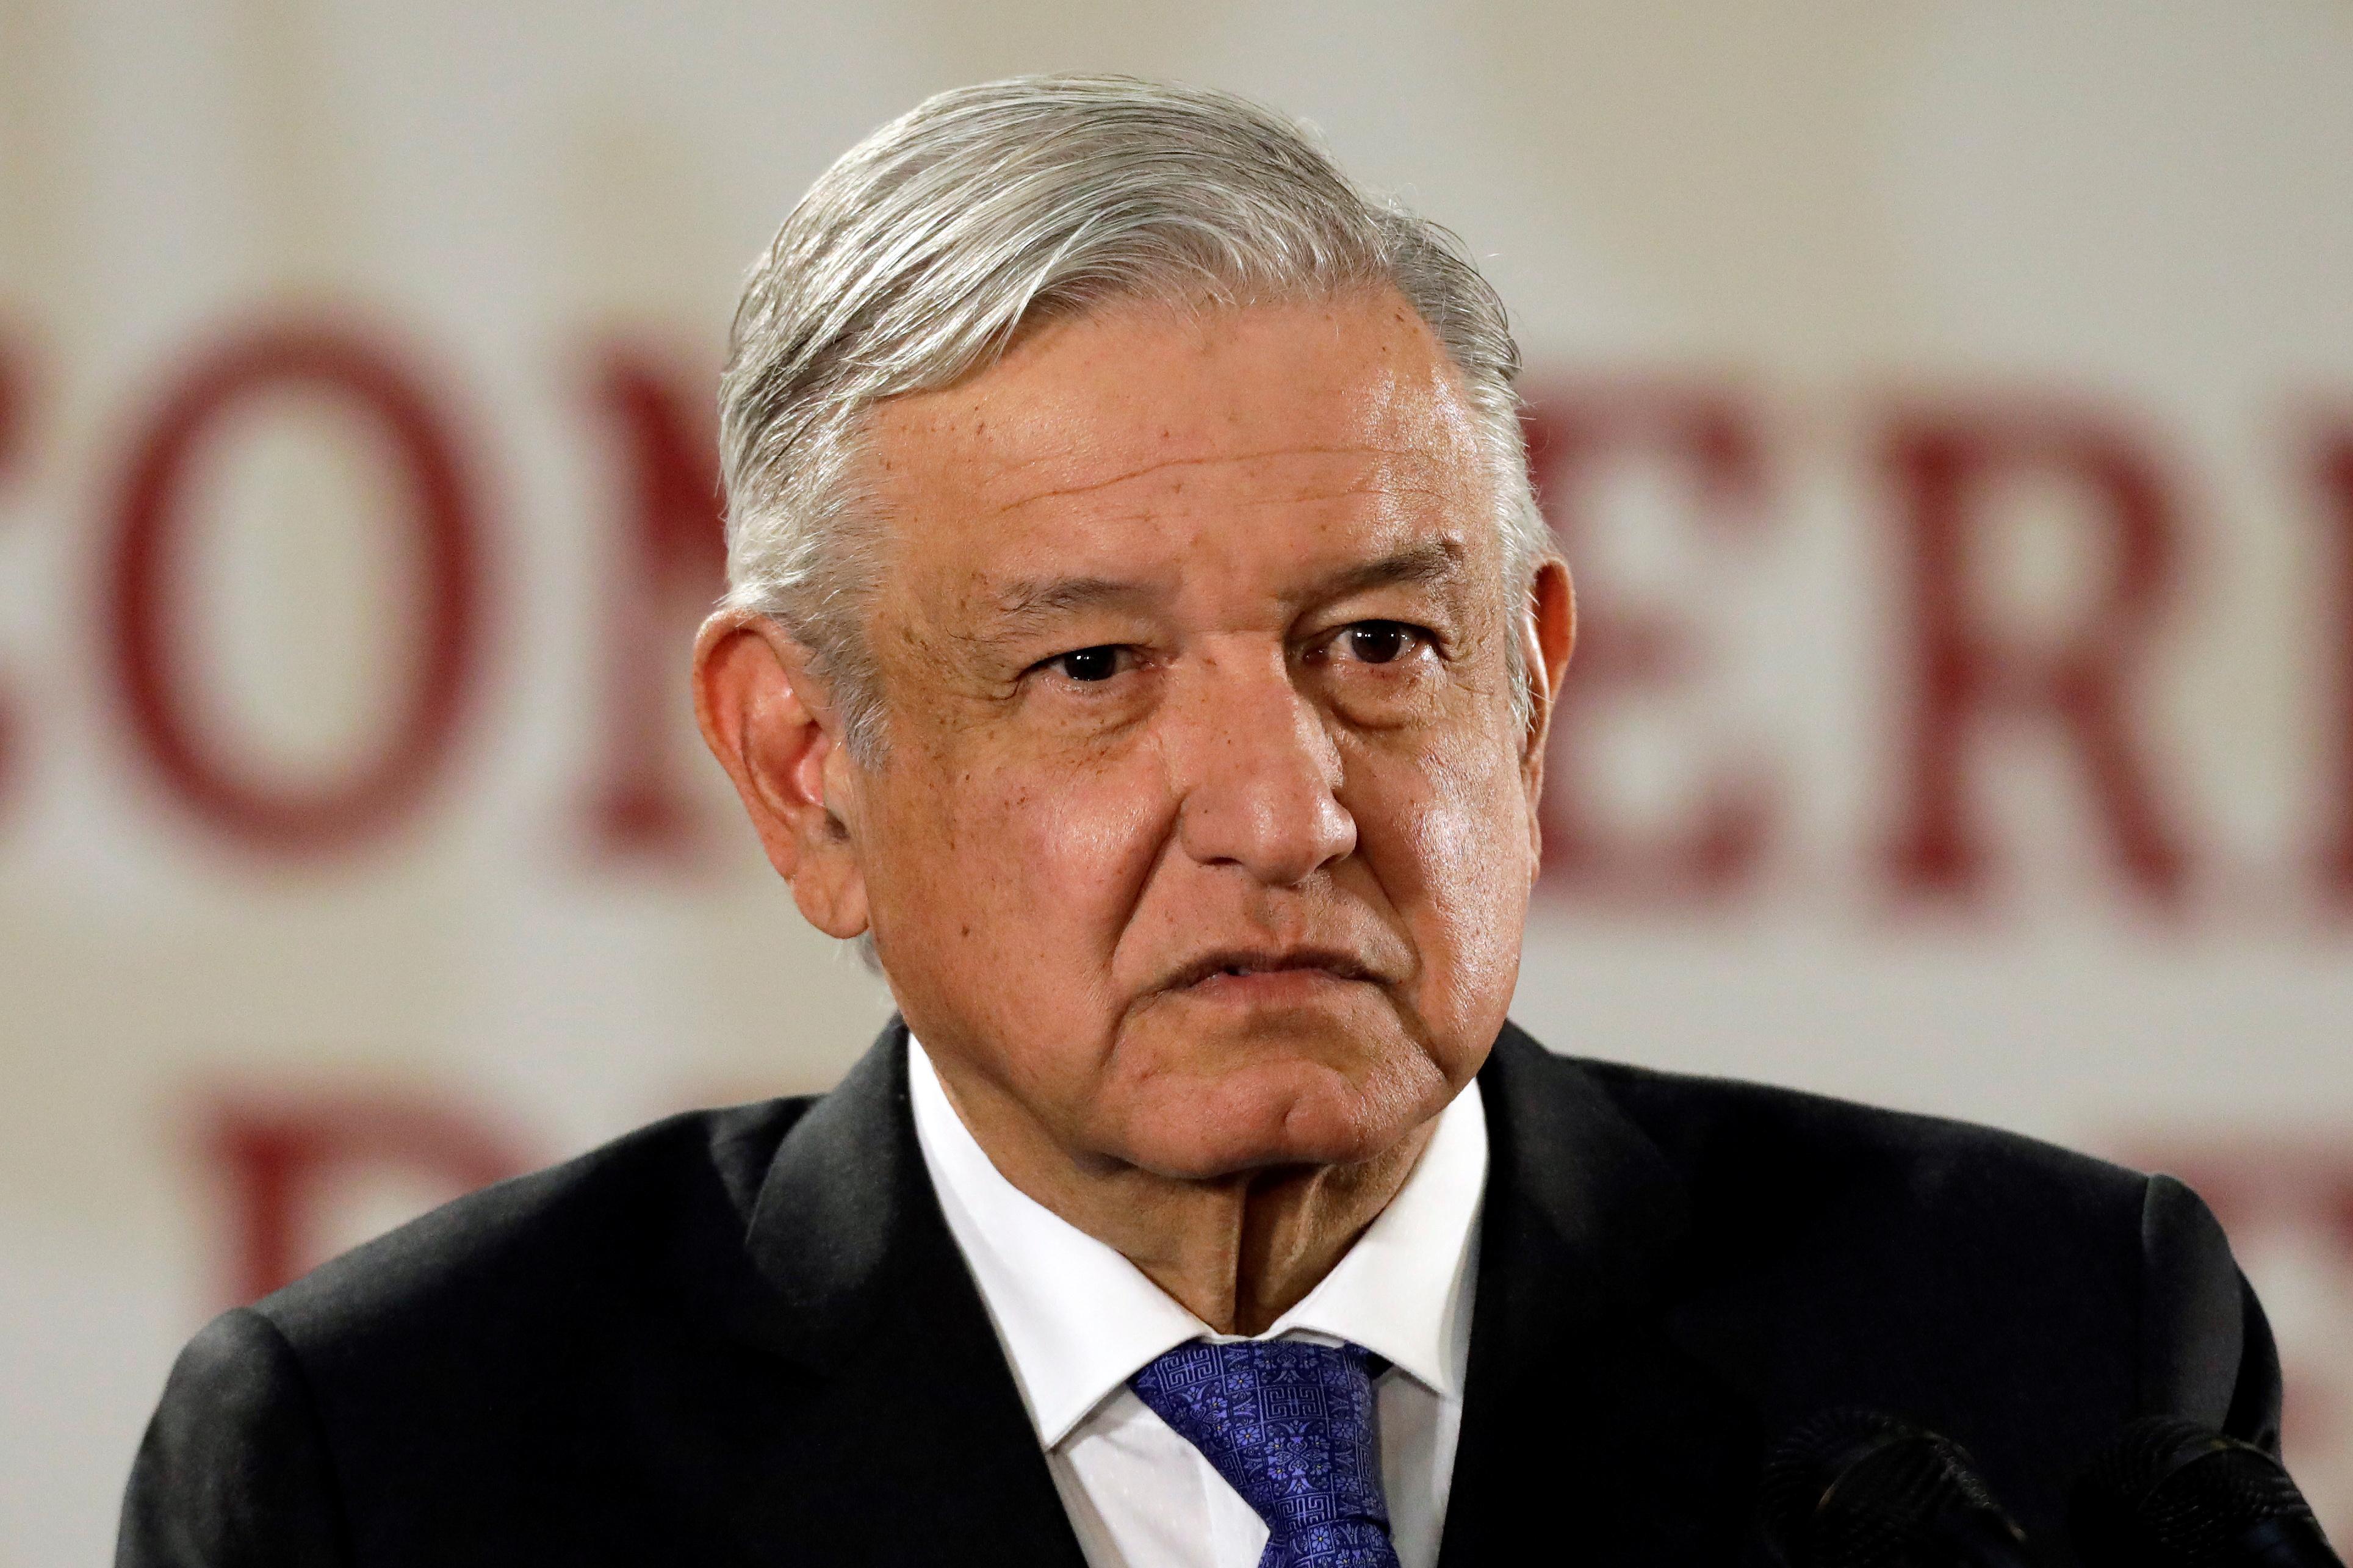 Mexico's president calls events in Bolivia 'regrettable'